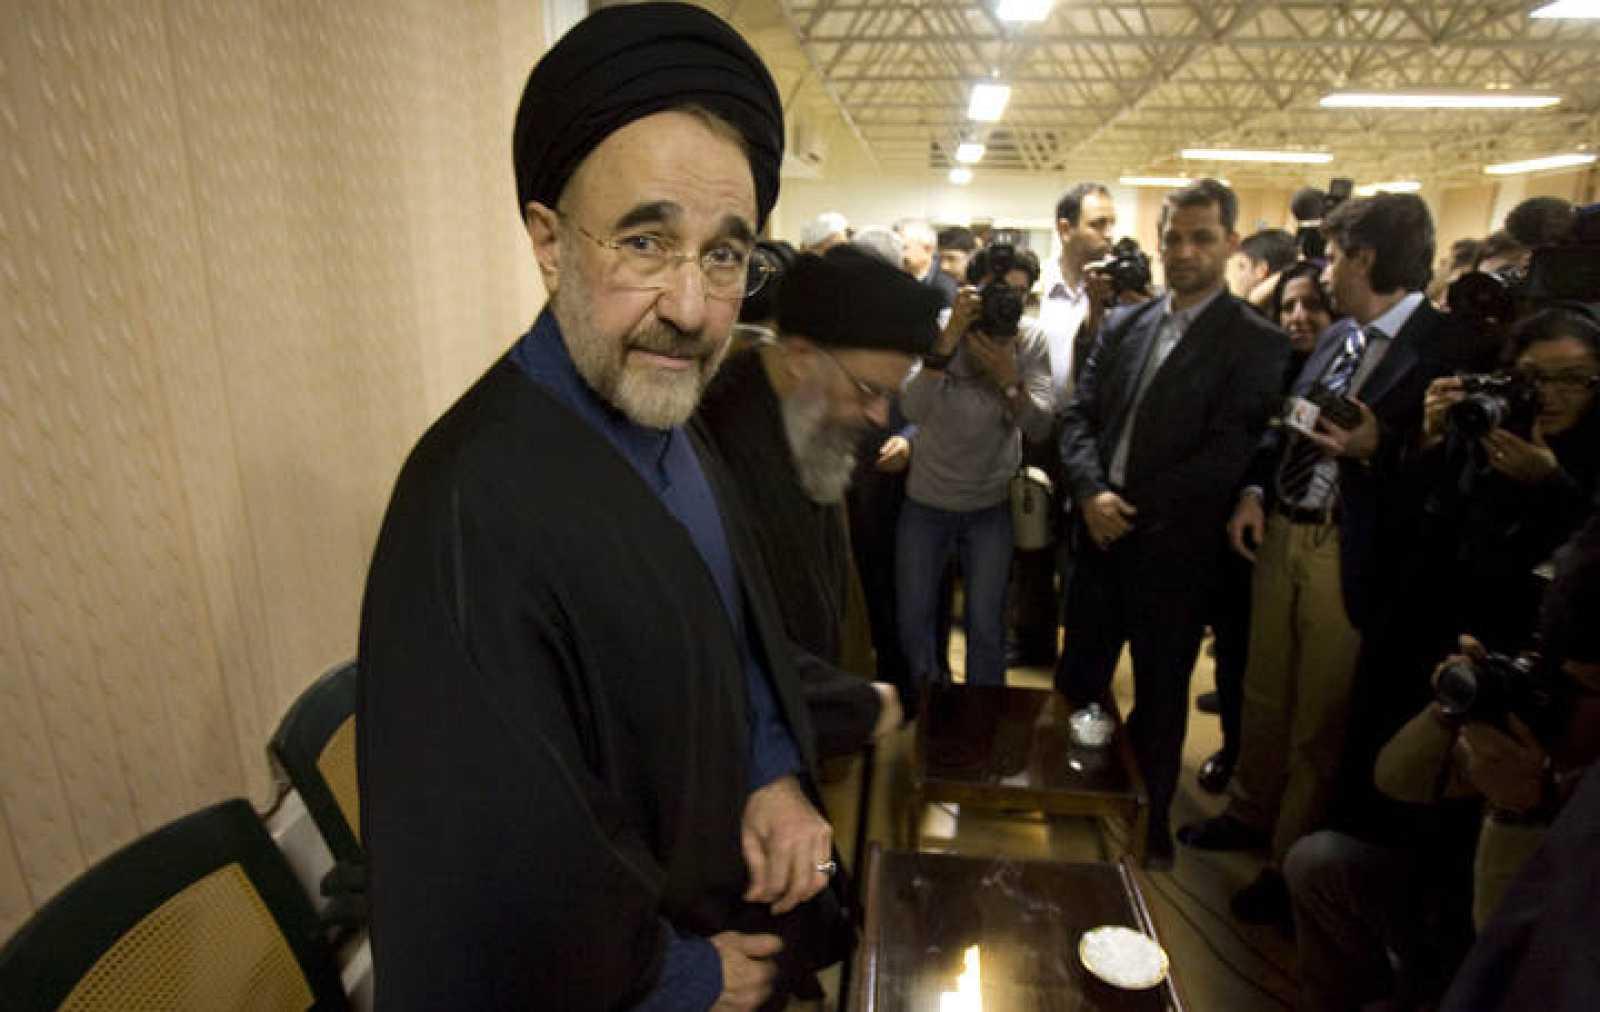 Jatamí gobernó Irán desde 1997 hasta 2005.